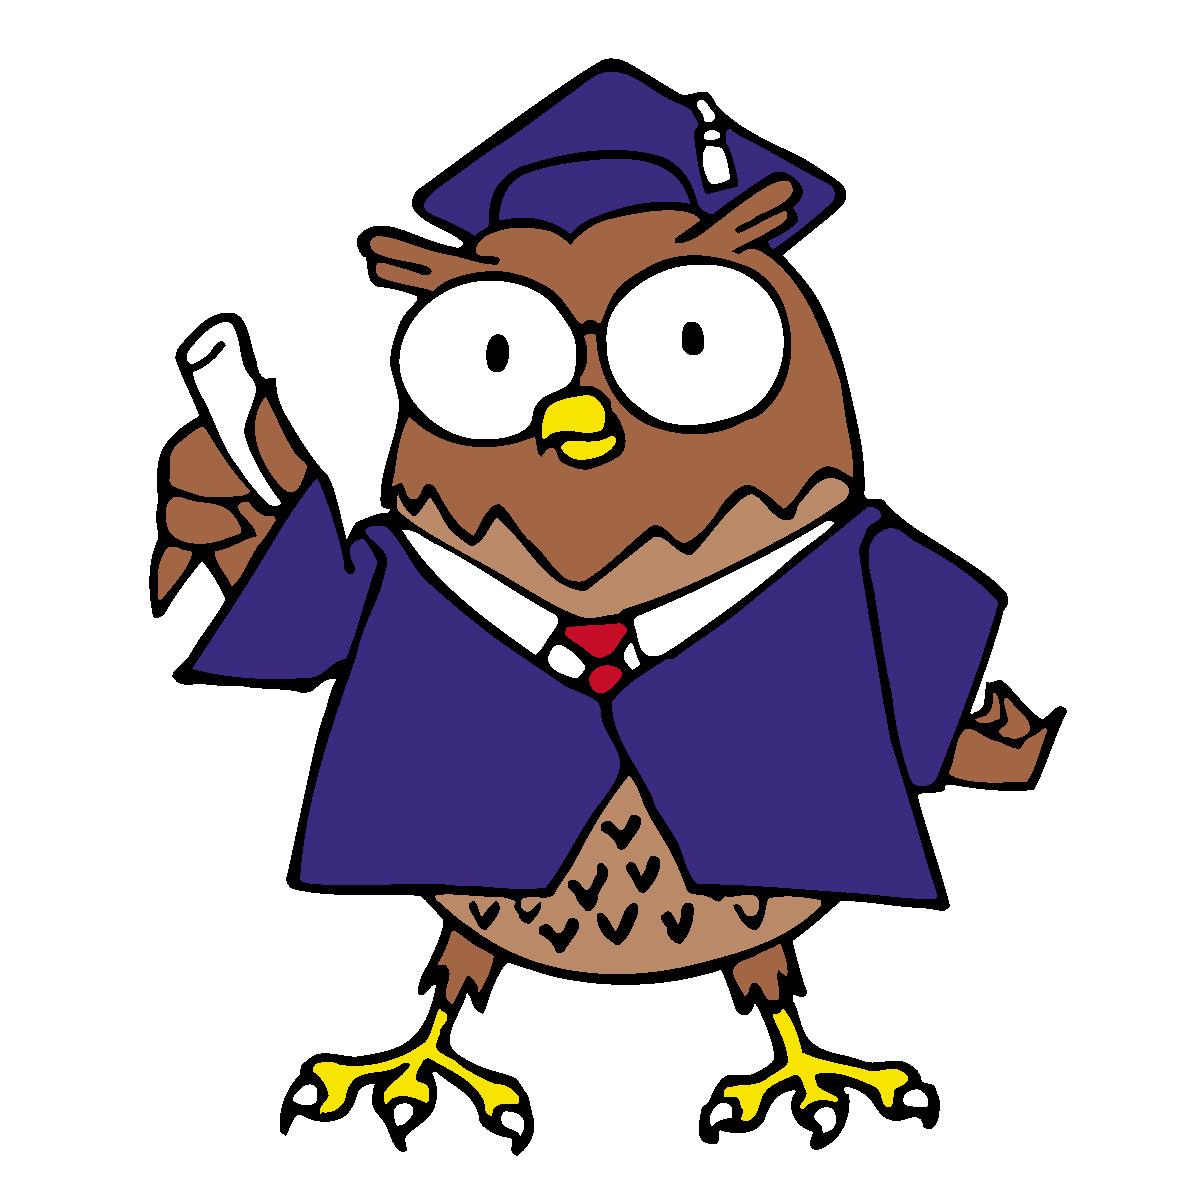 professorowlrgb